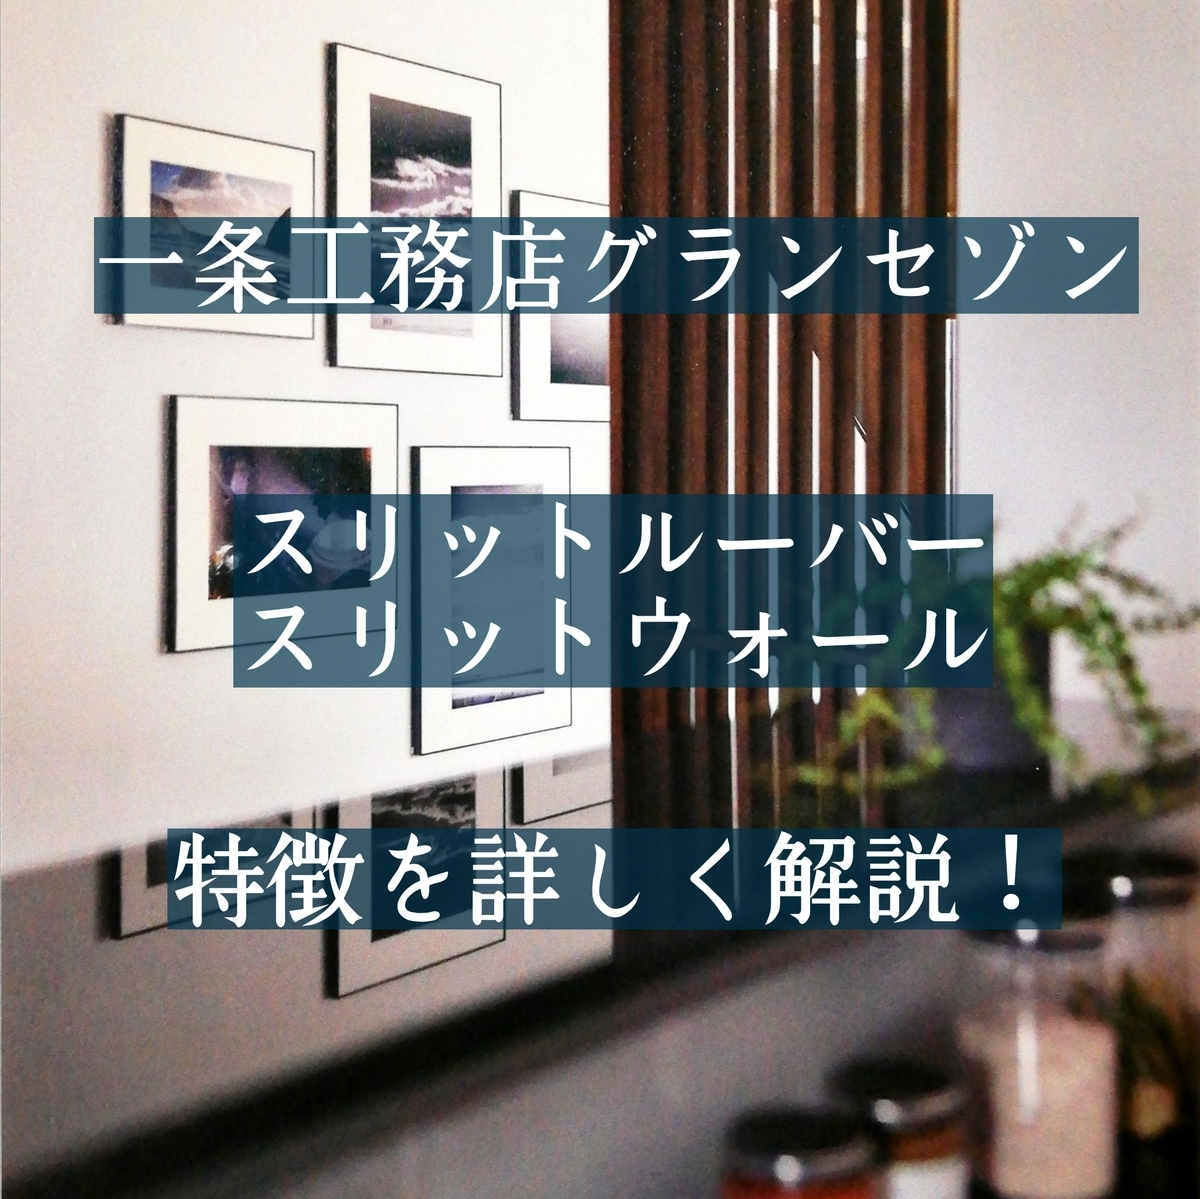 f:id:shioyan1130:20210131172712j:plain